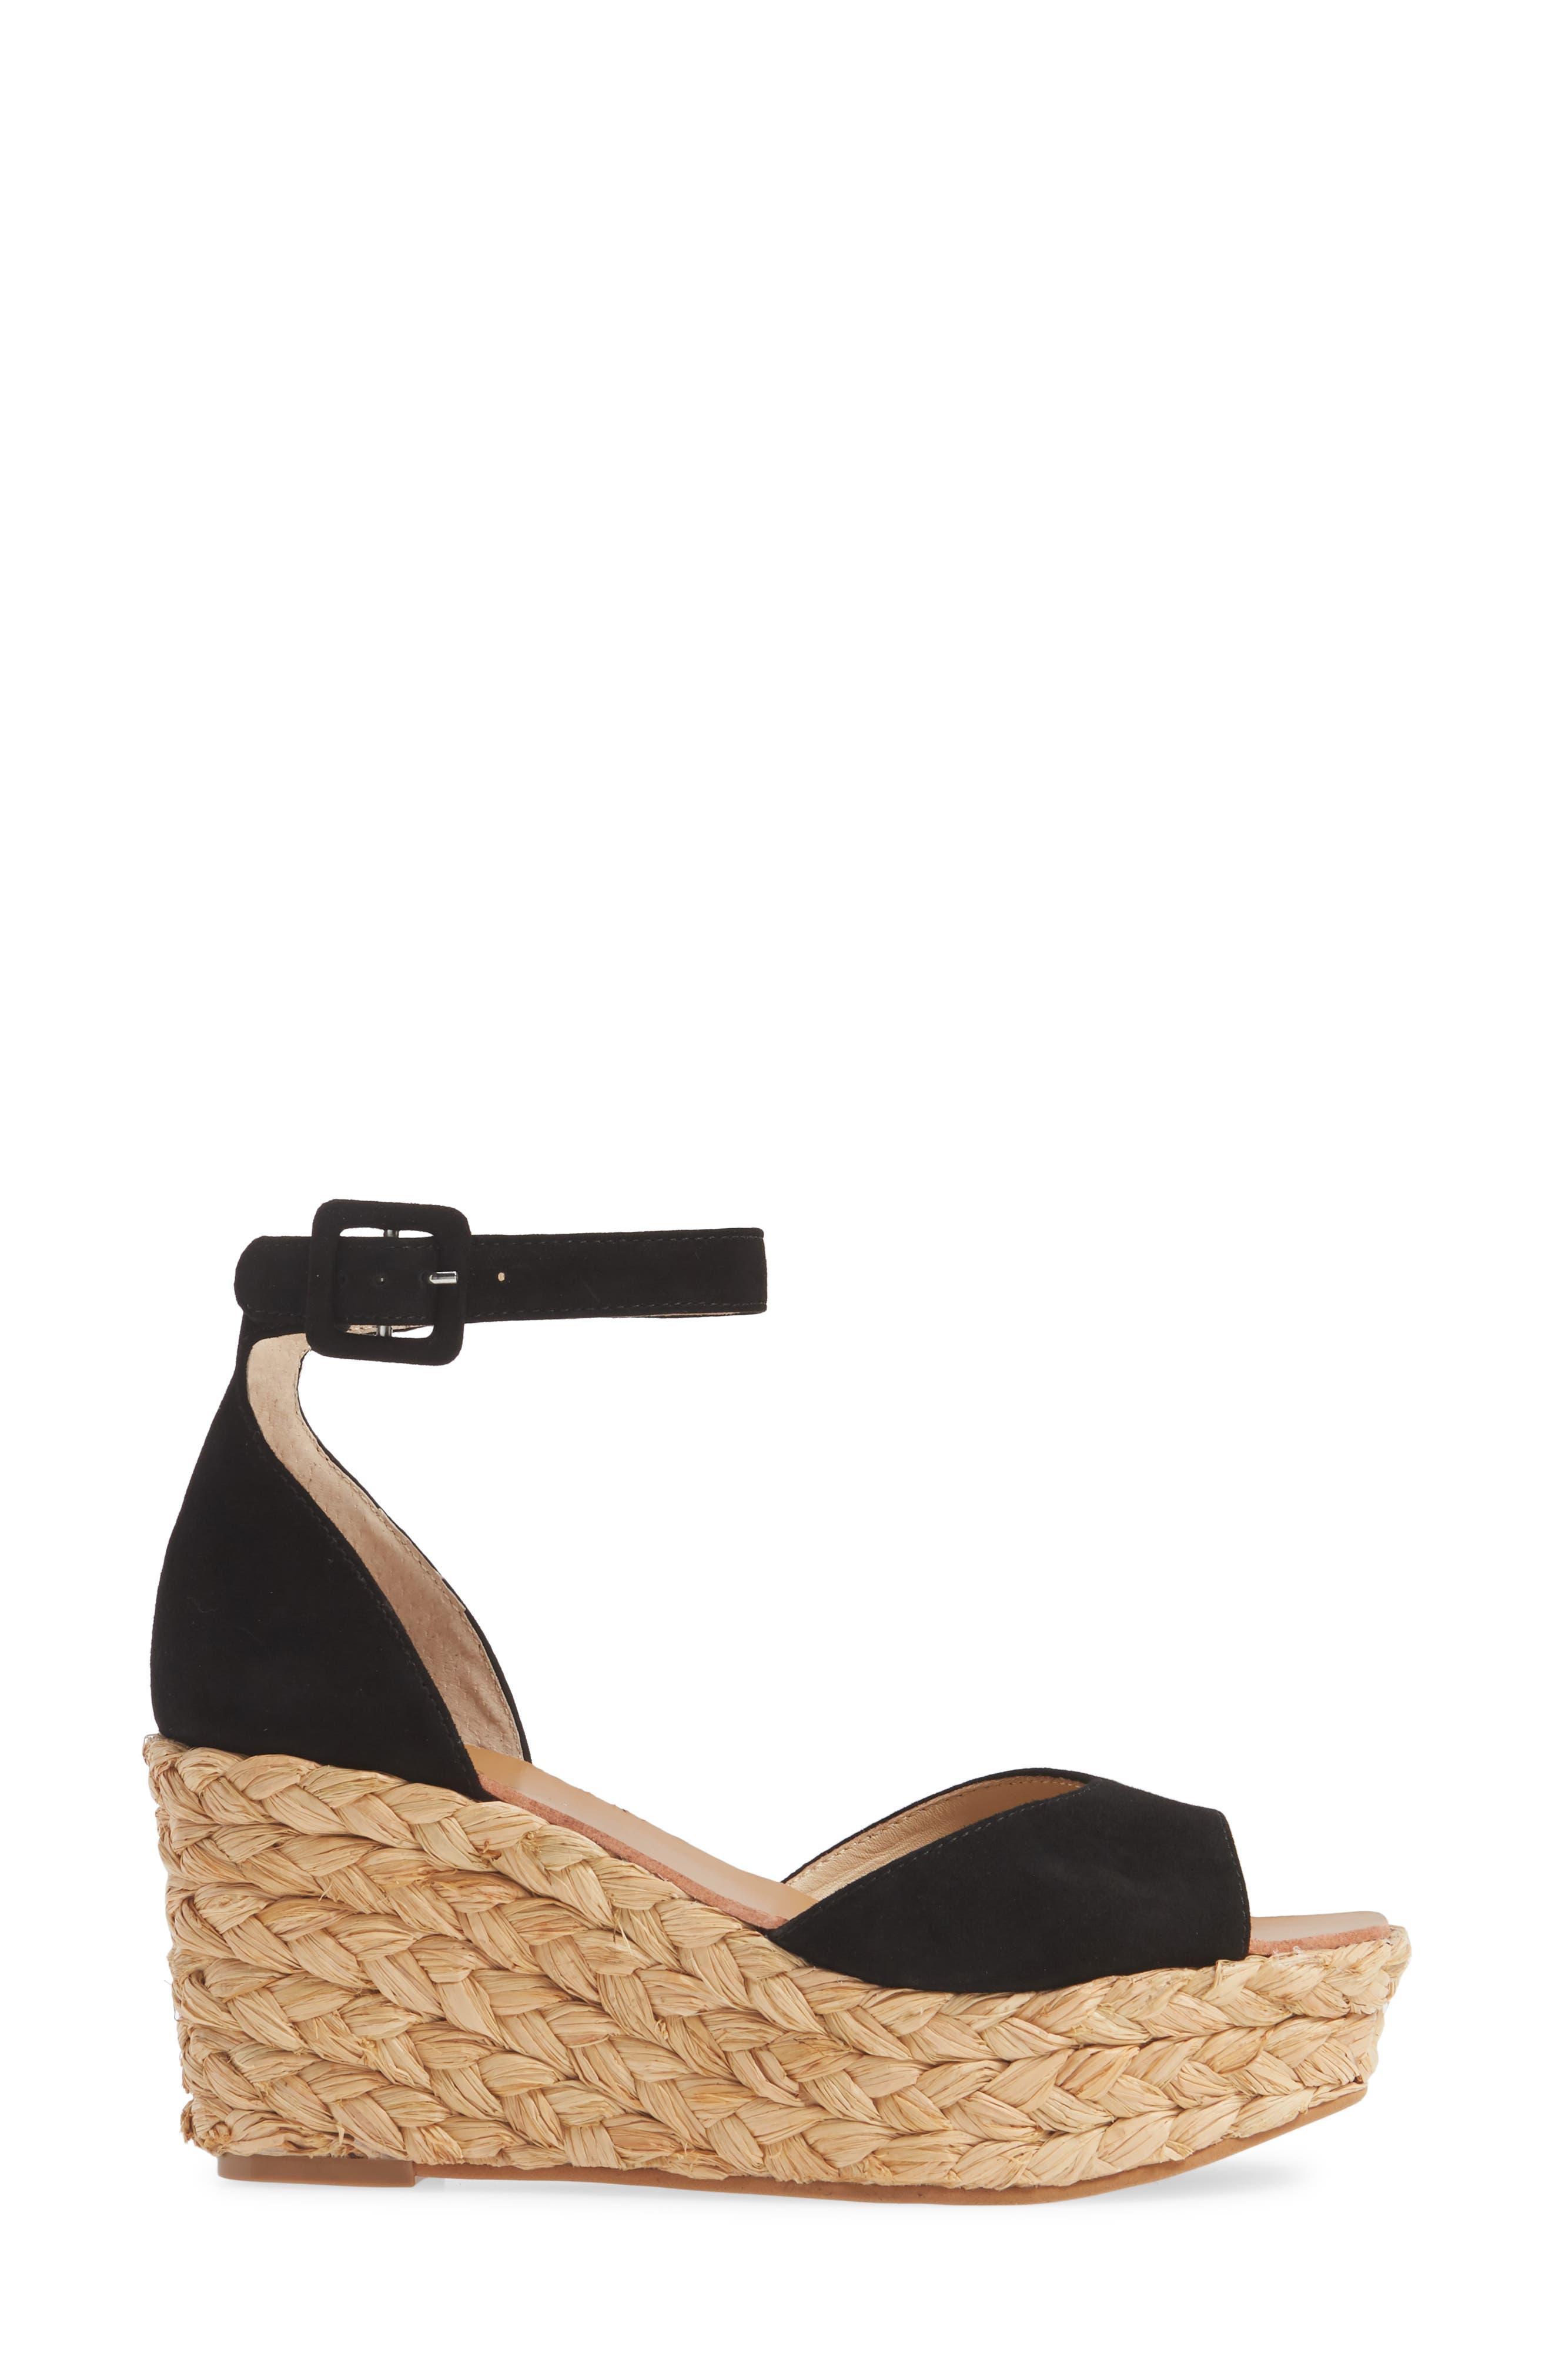 42 GOLD, Mindie Platform Wedge Sandal, Alternate thumbnail 3, color, BLACK SUEDE